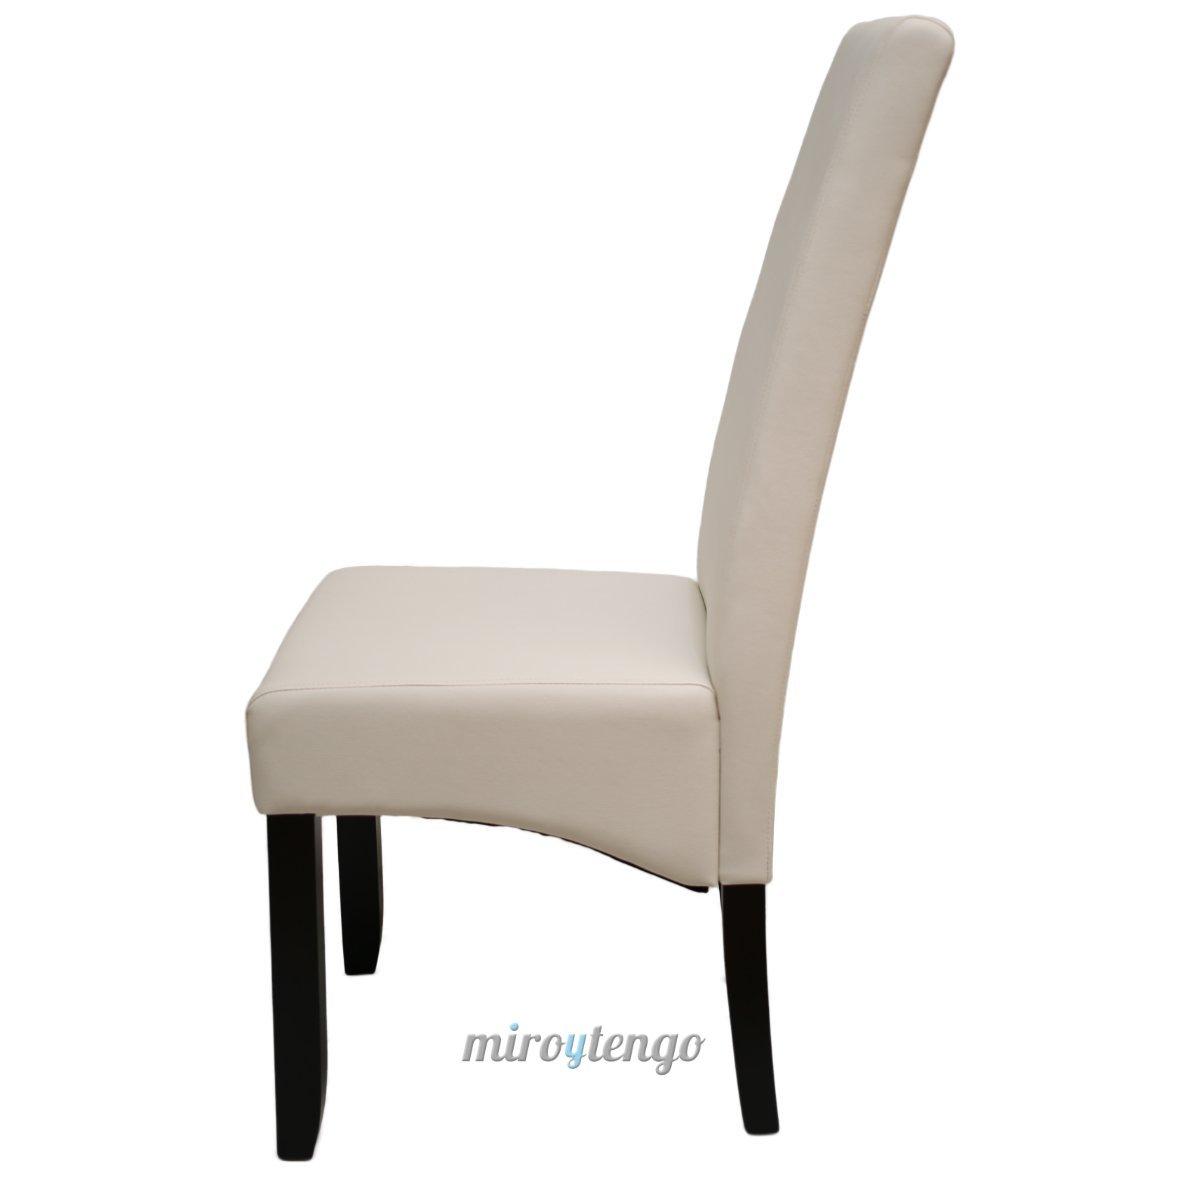 Pack de 4 sillas Osaka Blancas de salón Comedor de Polipiel Blanco Roto y Acolchadas Modelo, Modernas, económicas. Altura 108cm / Asiento 49x49cm